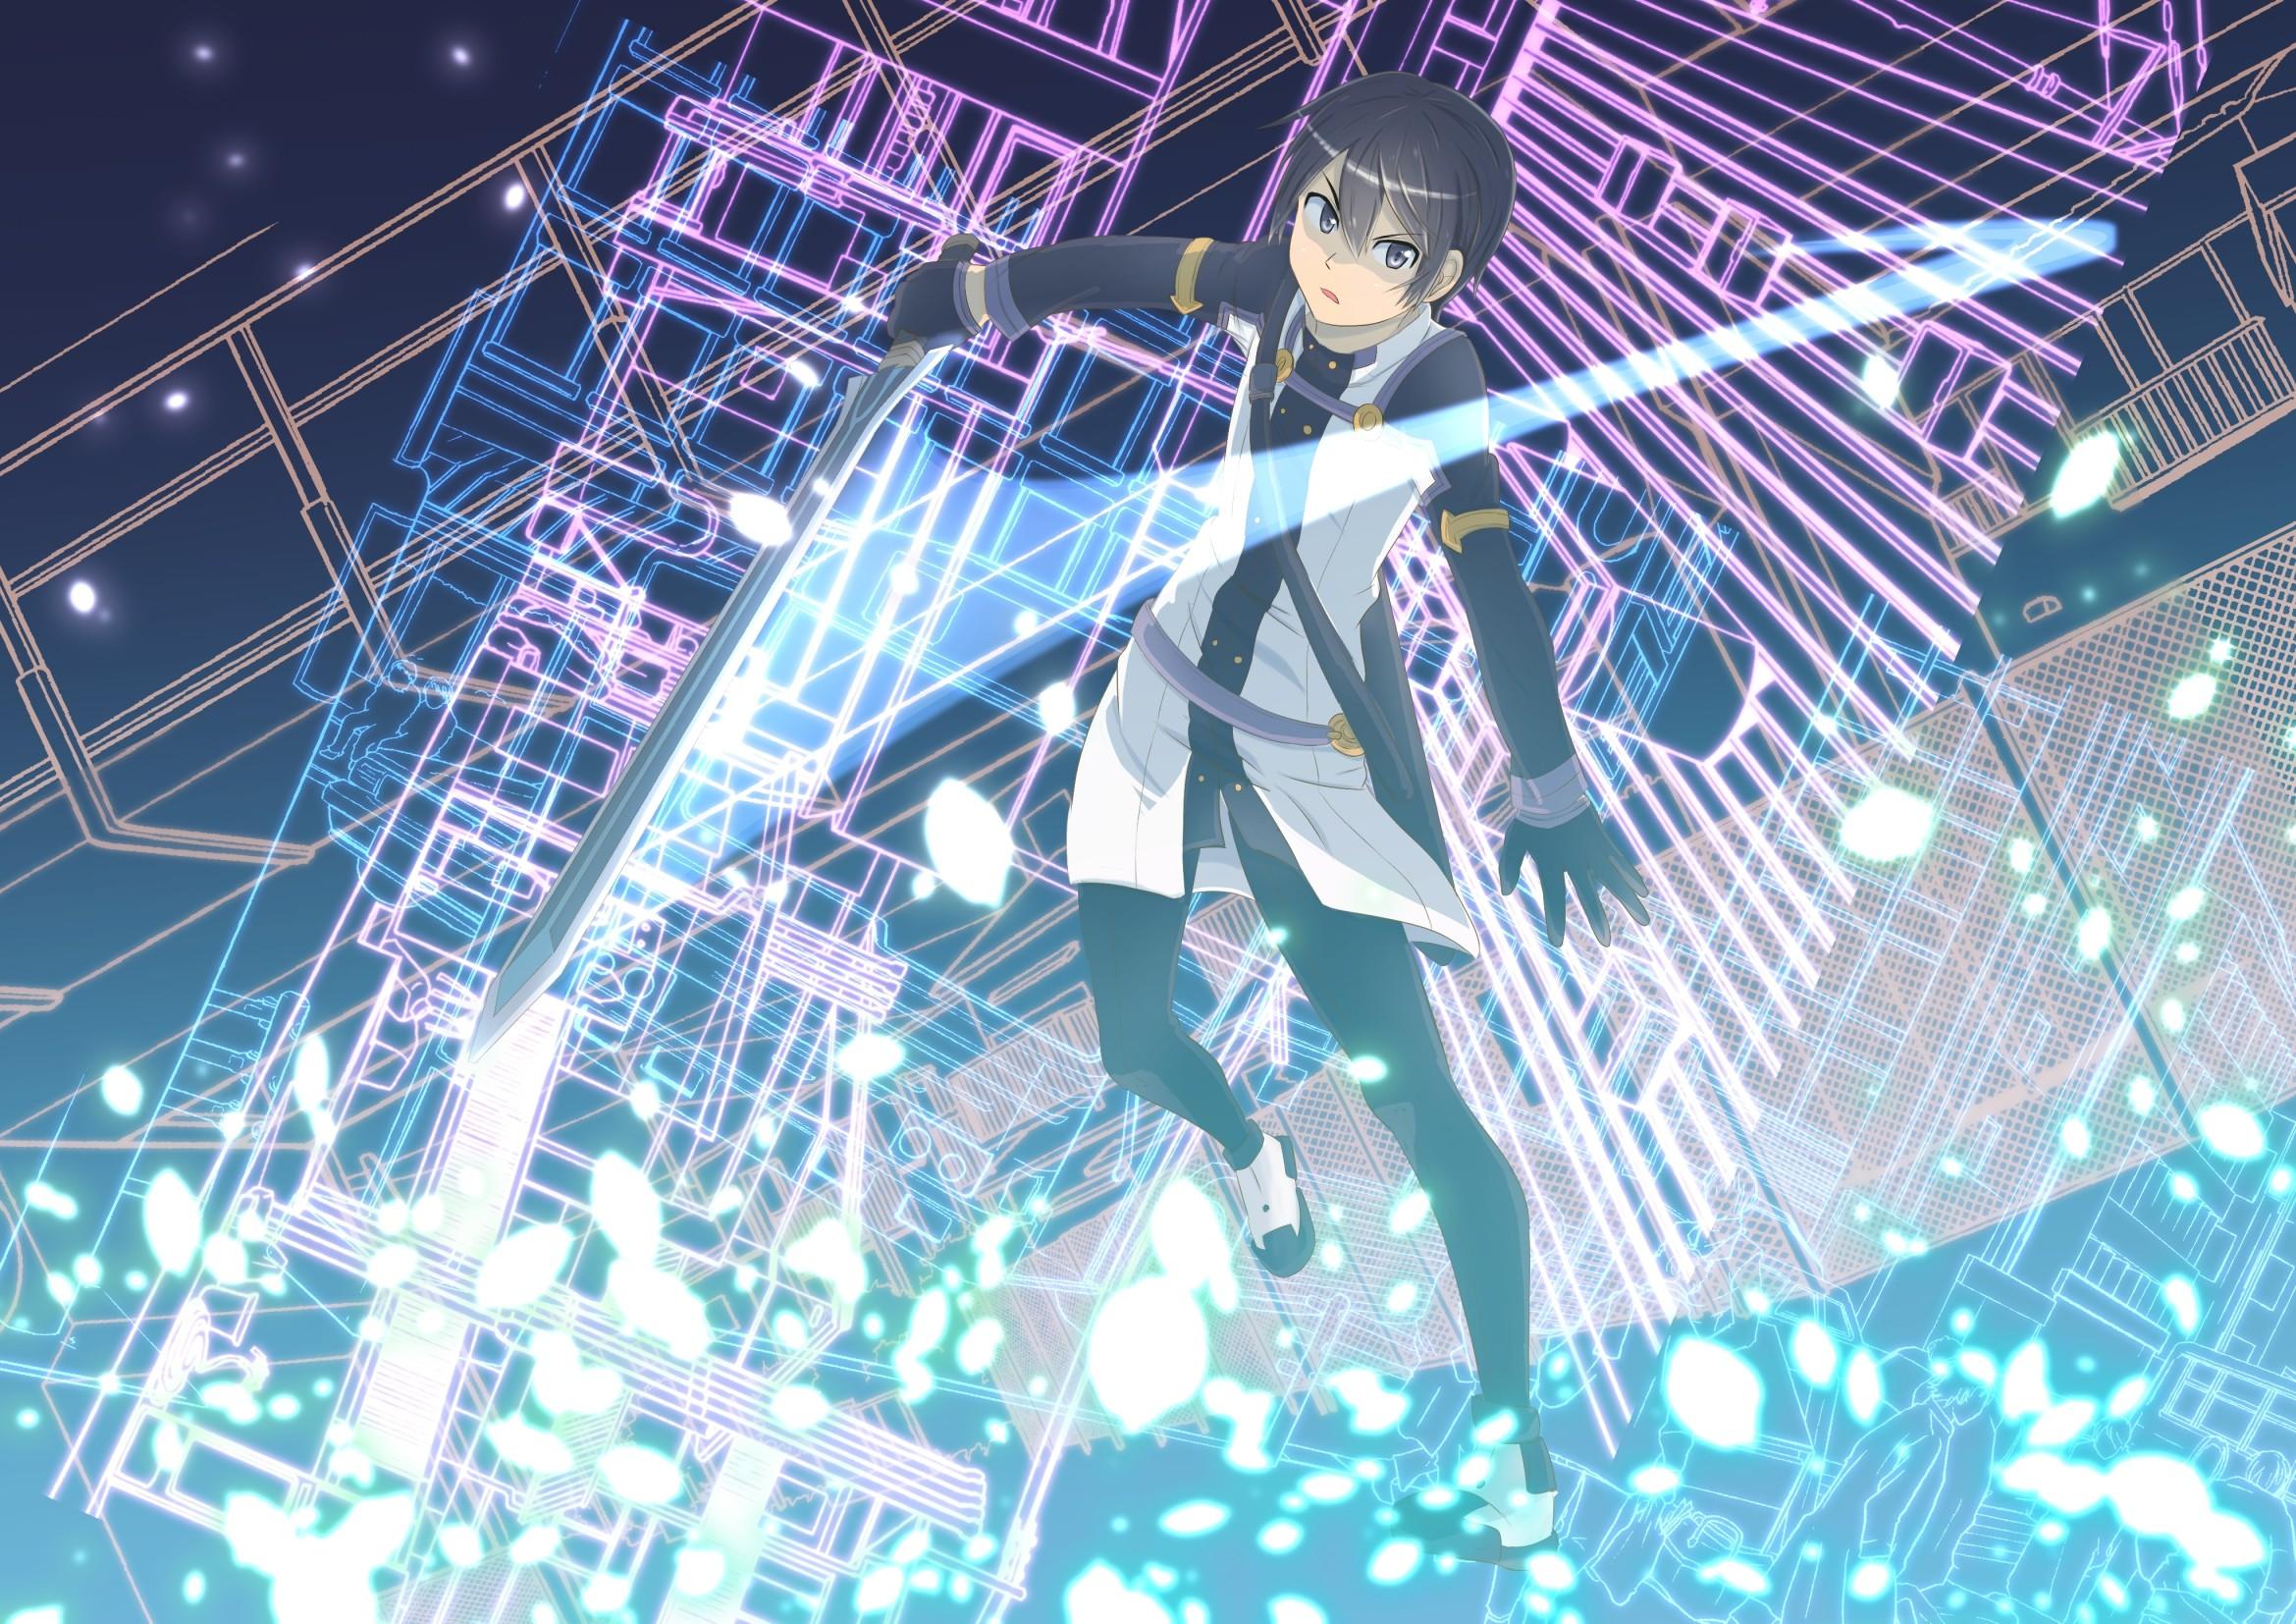 3840x1080 Sword Art Online Yuuki Asuna Anime Kirigaya Kazuto Multiple Display Wallpapers HD Desktop And Mobile Backgrounds